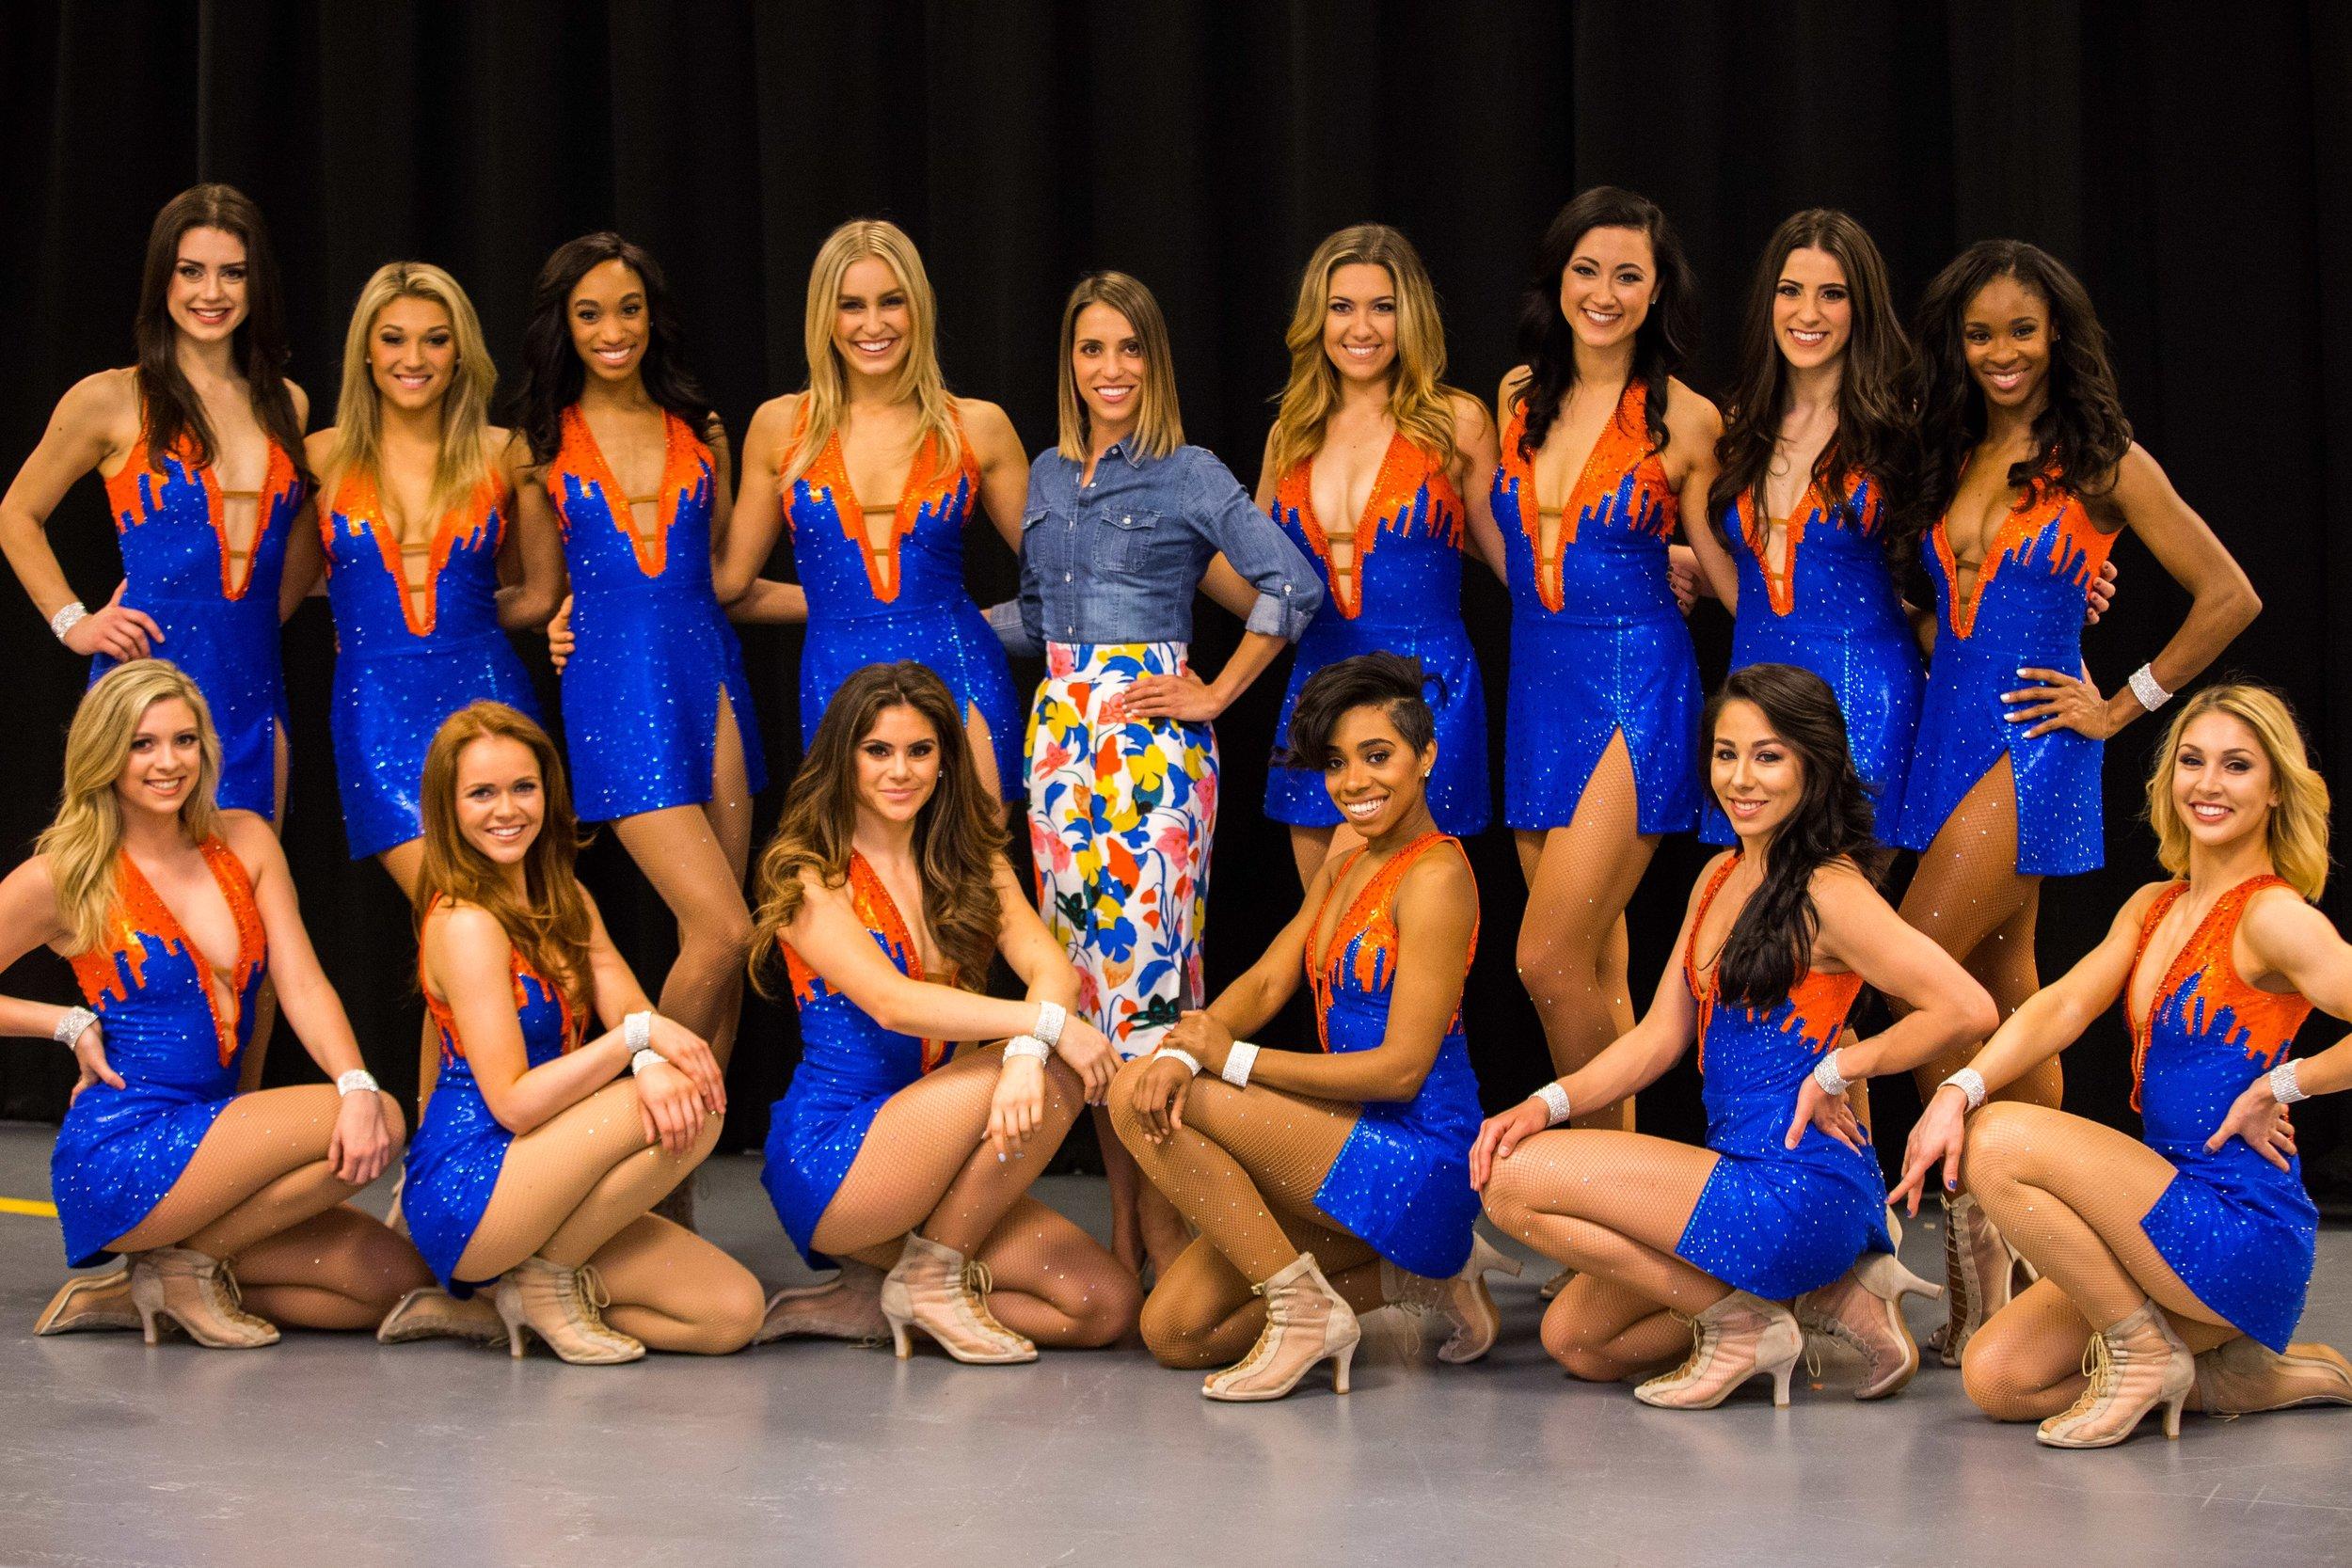 Monica with her NY Knicks Dance Team. Photo courtesy of Marissa Piloto.